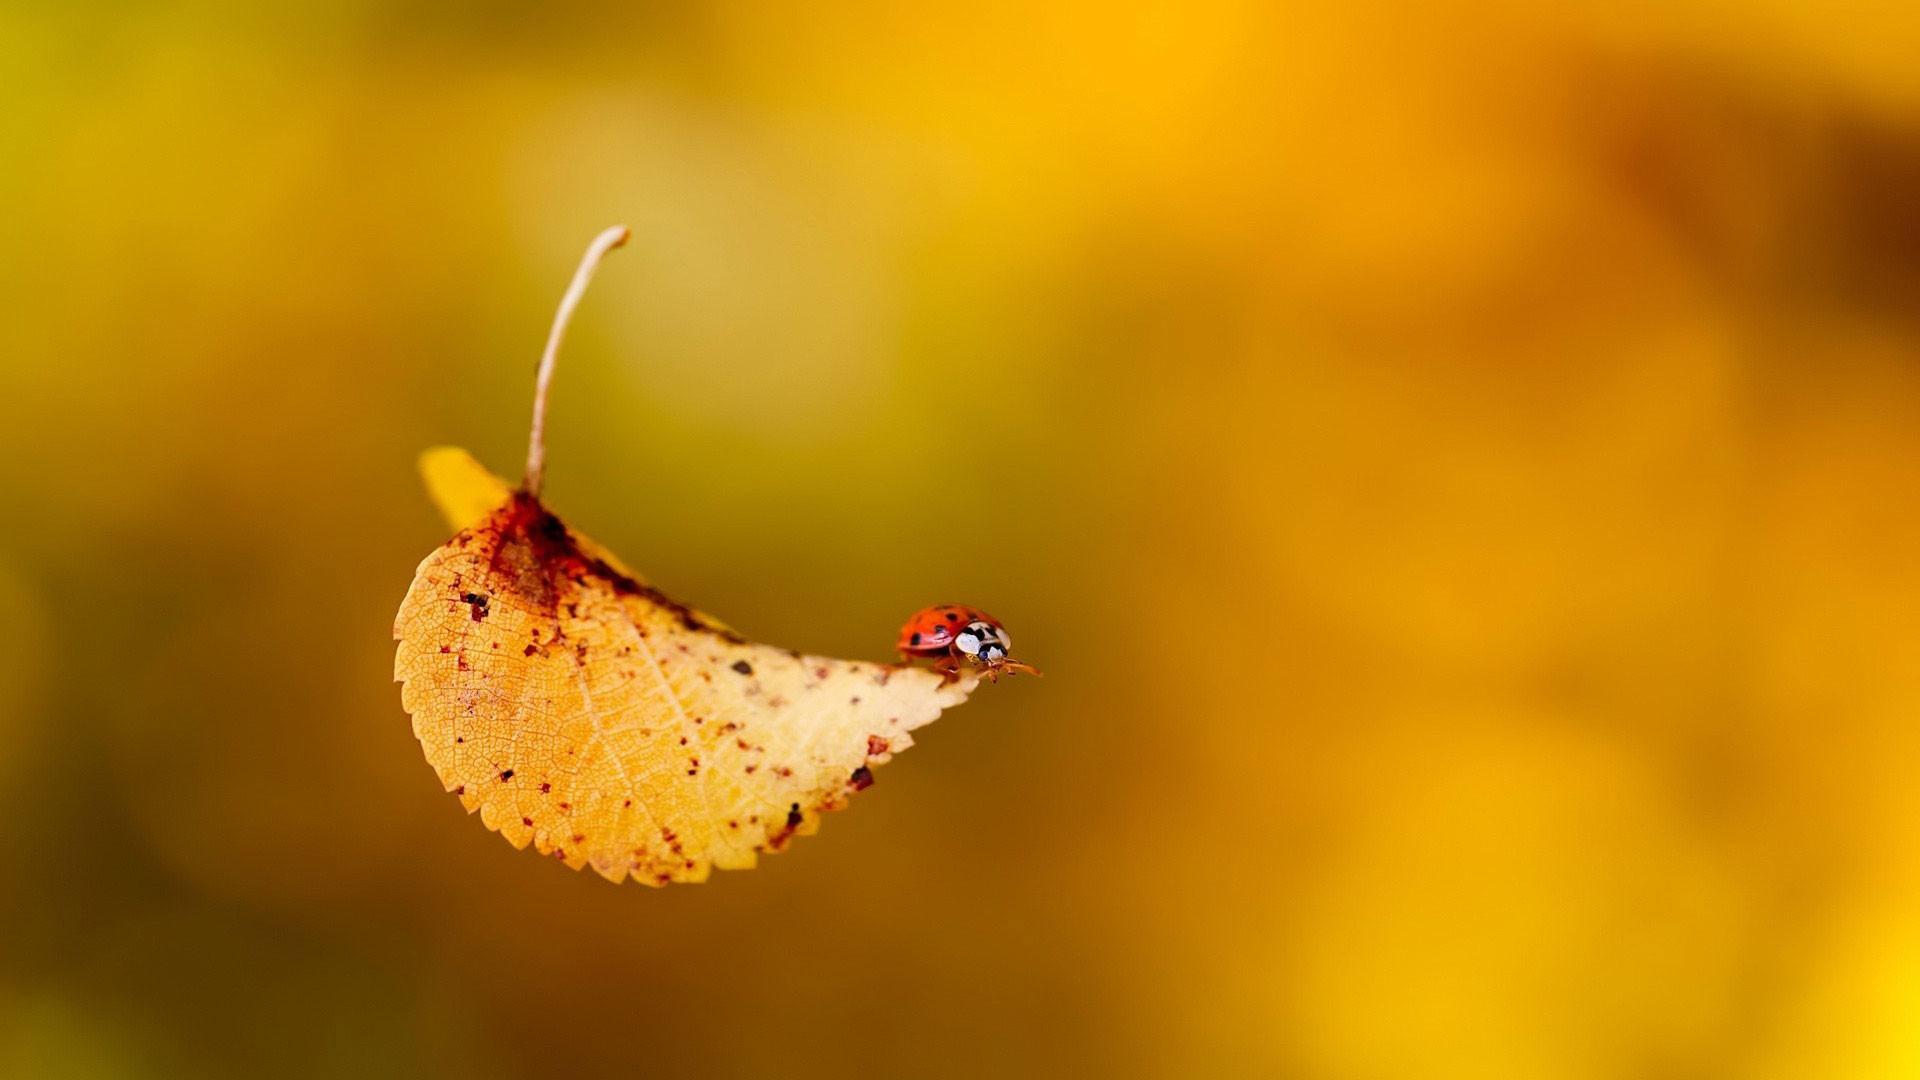 hd pics photos yellow lady bugs leaves macro desktop background wallpaper